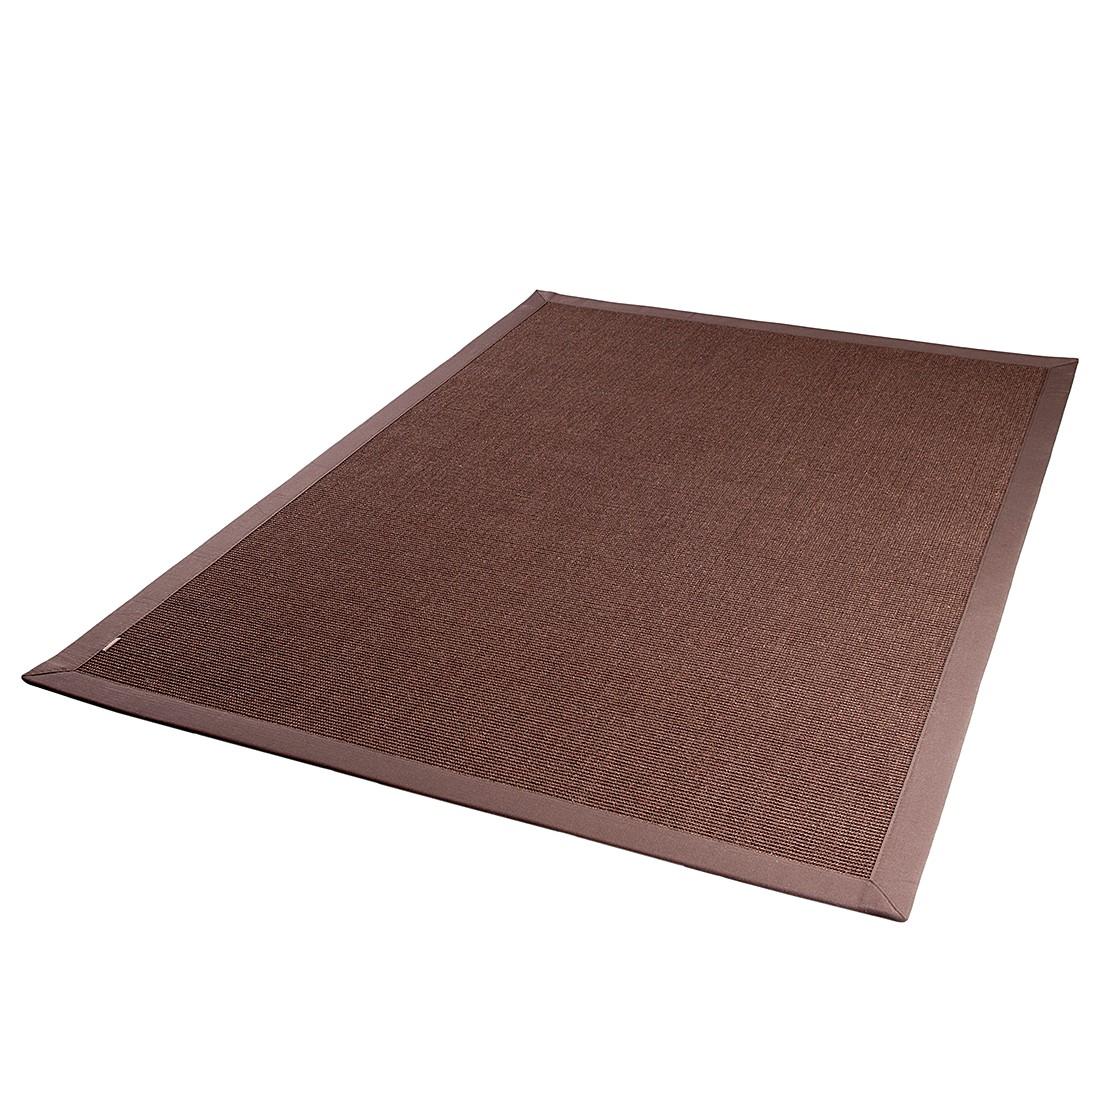 teppich mara a2 mokka 170 x 230 cm dekowe g nstig. Black Bedroom Furniture Sets. Home Design Ideas